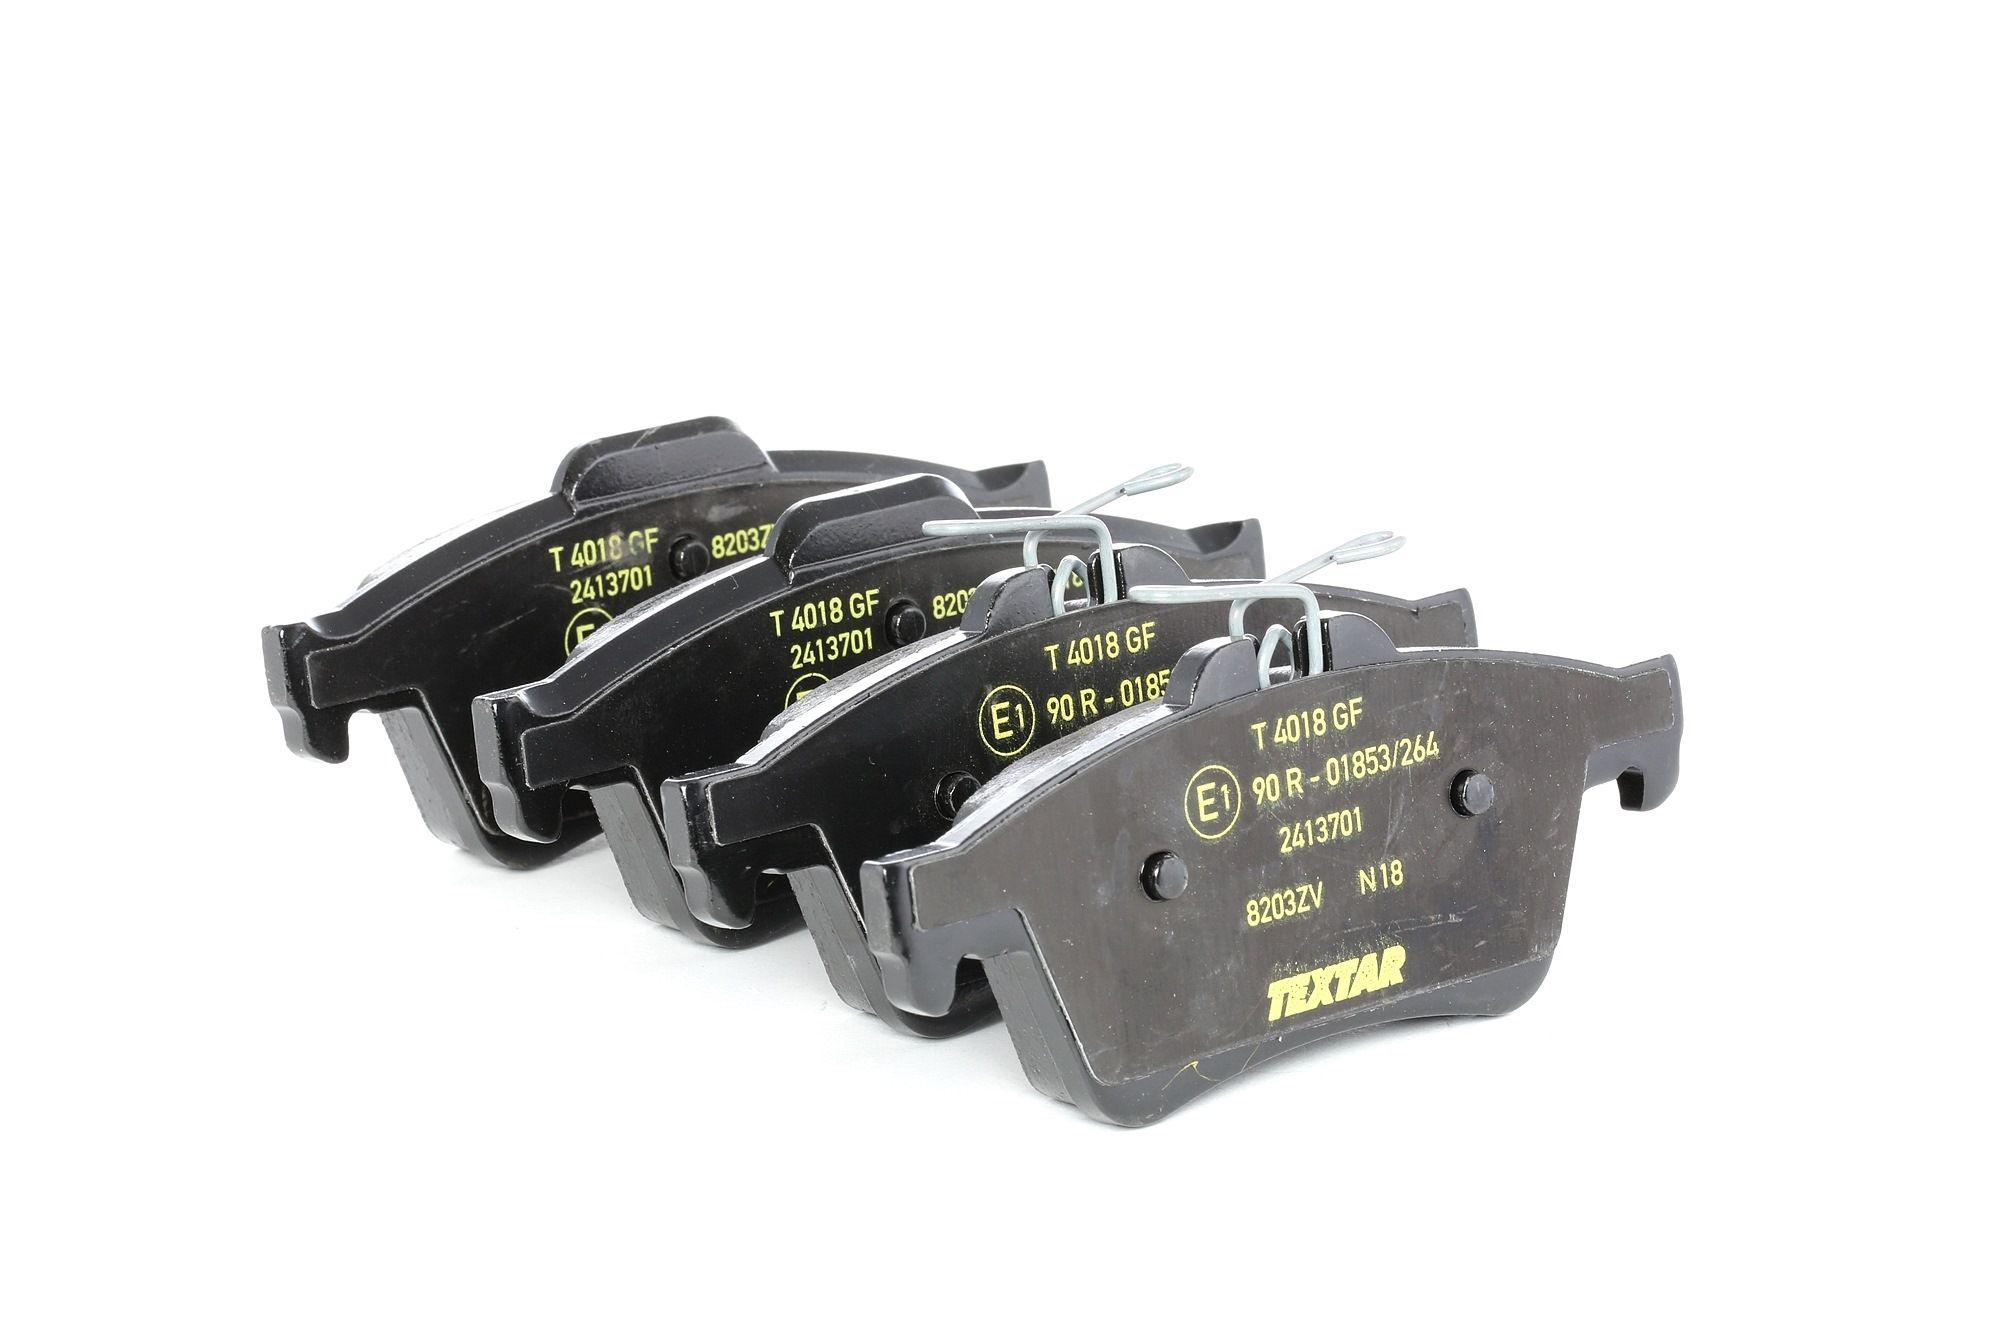 TEXTAR: Original Bremsbelagsatz 2413701 (Höhe: 51,9mm, Breite: 123,2mm, Dicke/Stärke: 16,7mm)